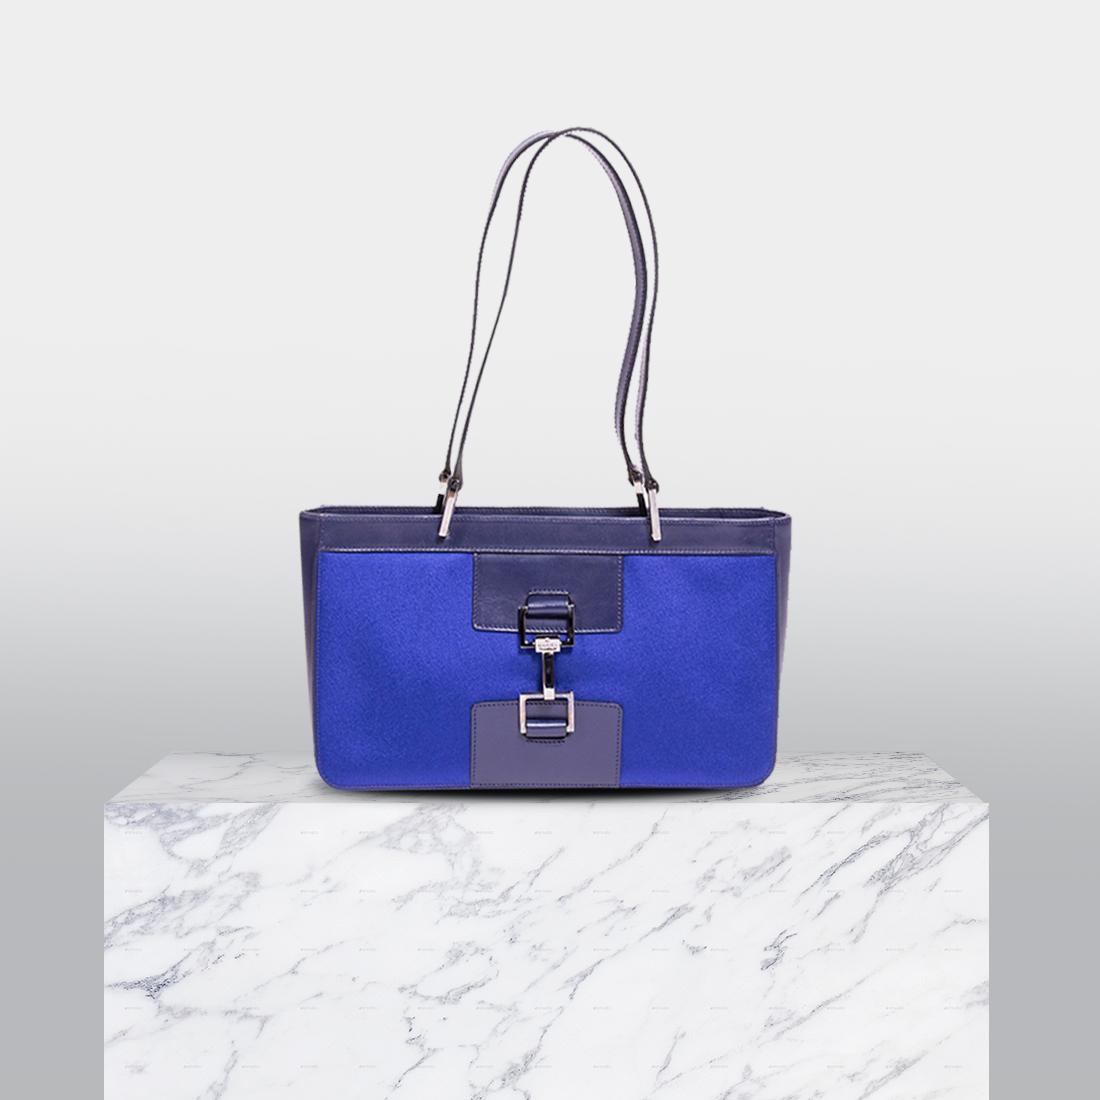 552ee2eeb1d3 Shop authentic Prada Saffiano Lux Tote Cargo at revogue for just USD  1,600.00 | Handbags by Re-Vogue | Prada saffiano, Prada, Bags